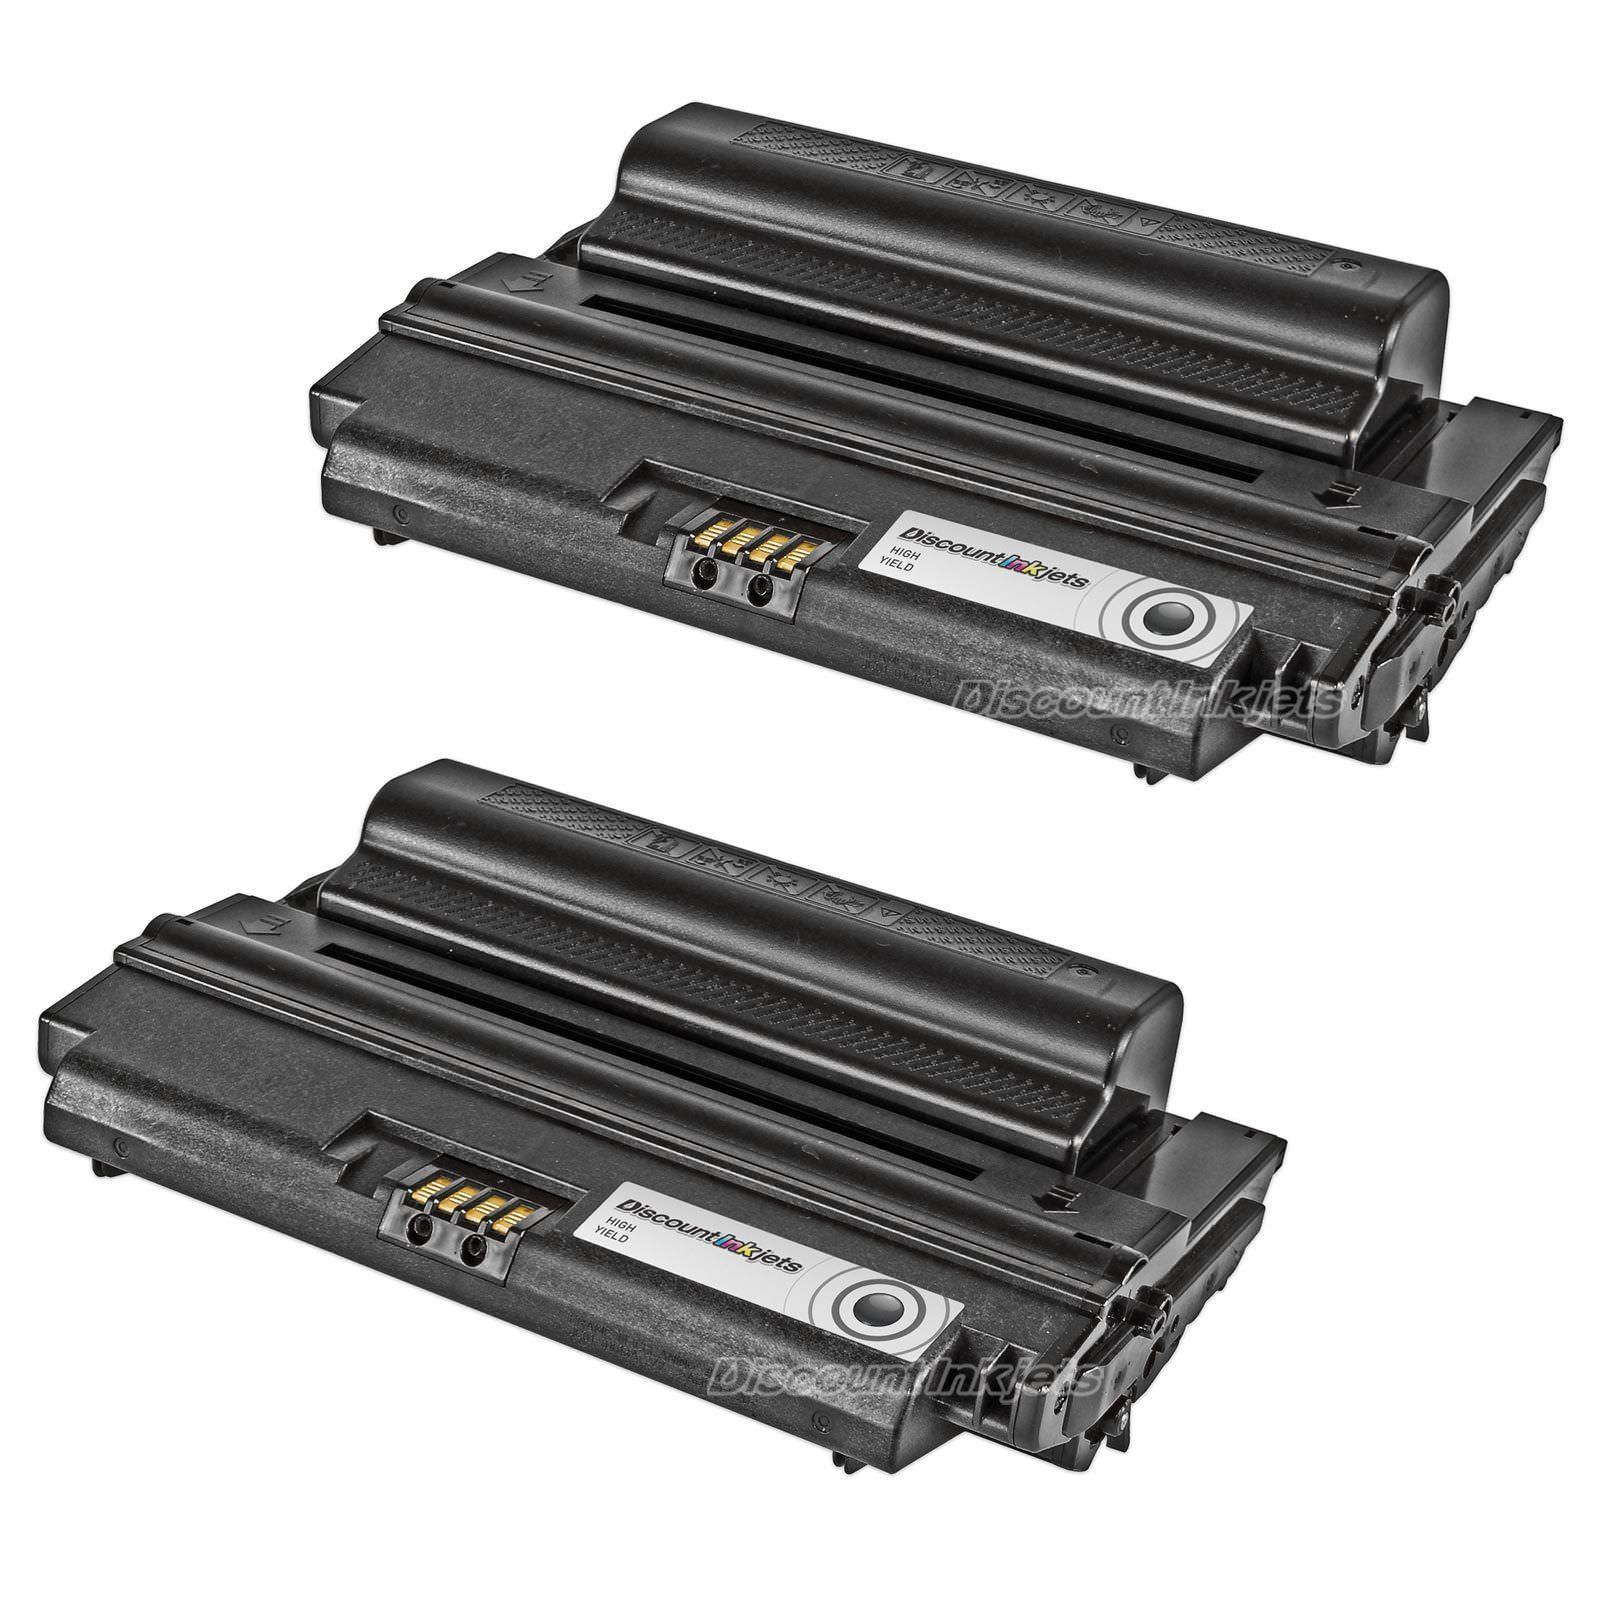 10 NX994 330-2209 High Yield BLACK Printer Laser Toner Cartridge for Dell 2355dn